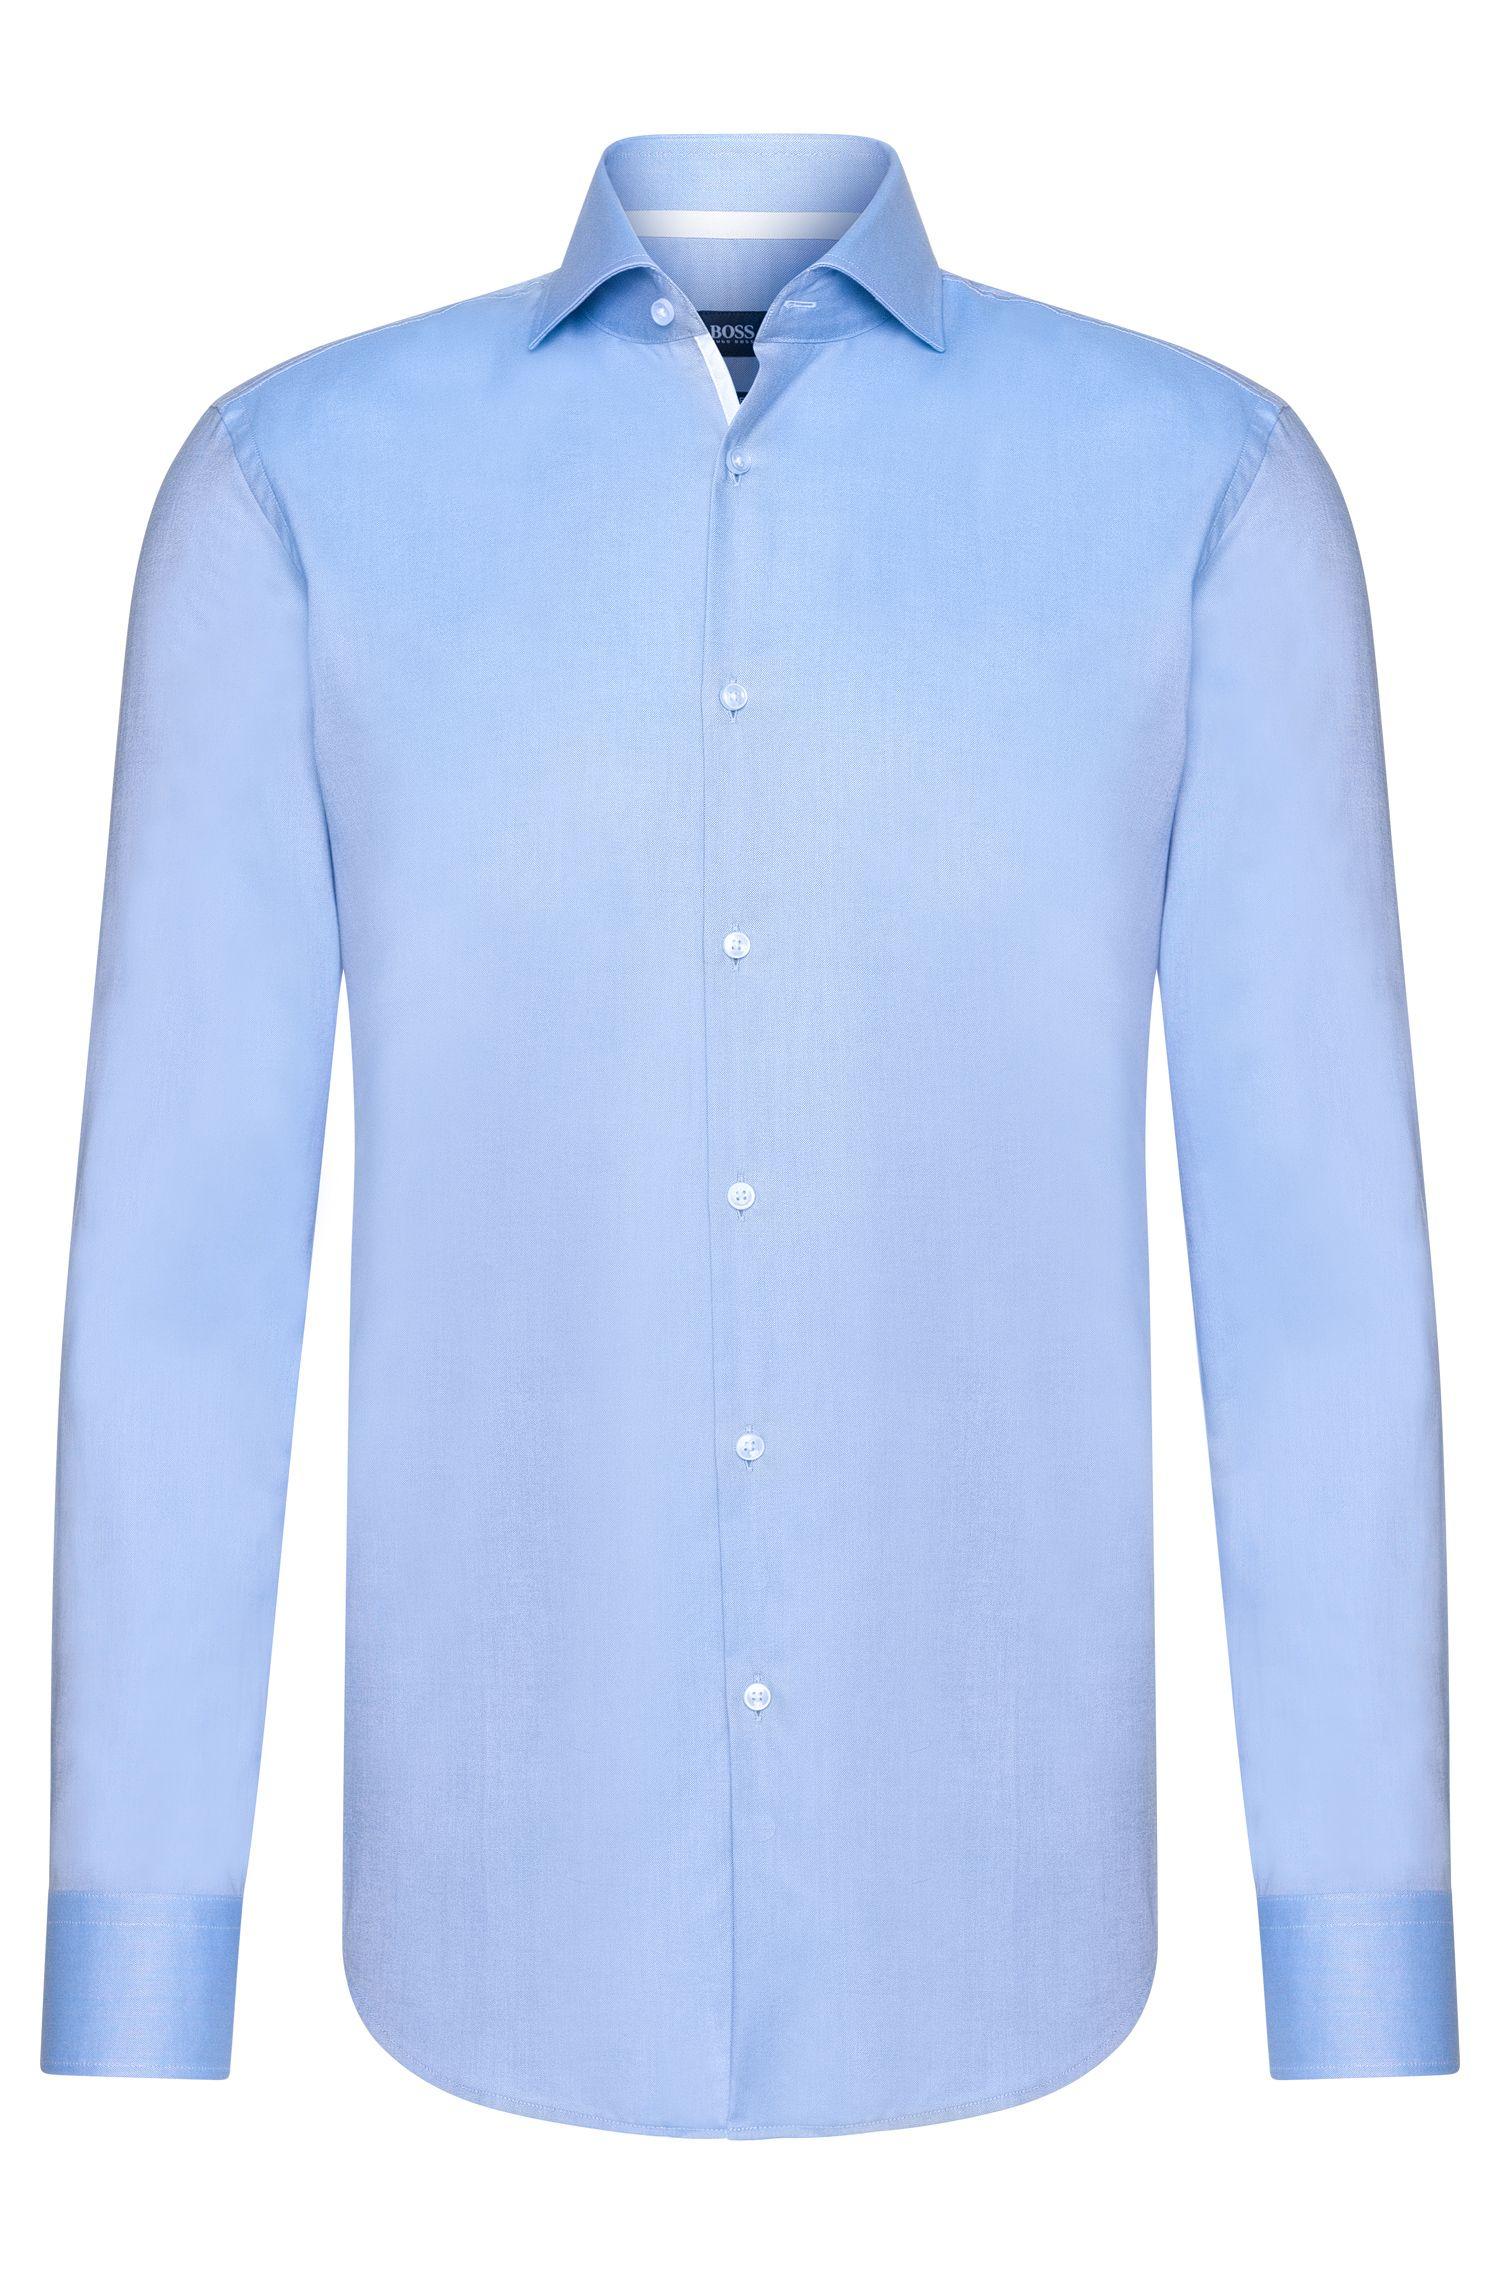 Slim-Fit Hemd aus Baumwolle mit Kontrast-Elementen: 'Jery'